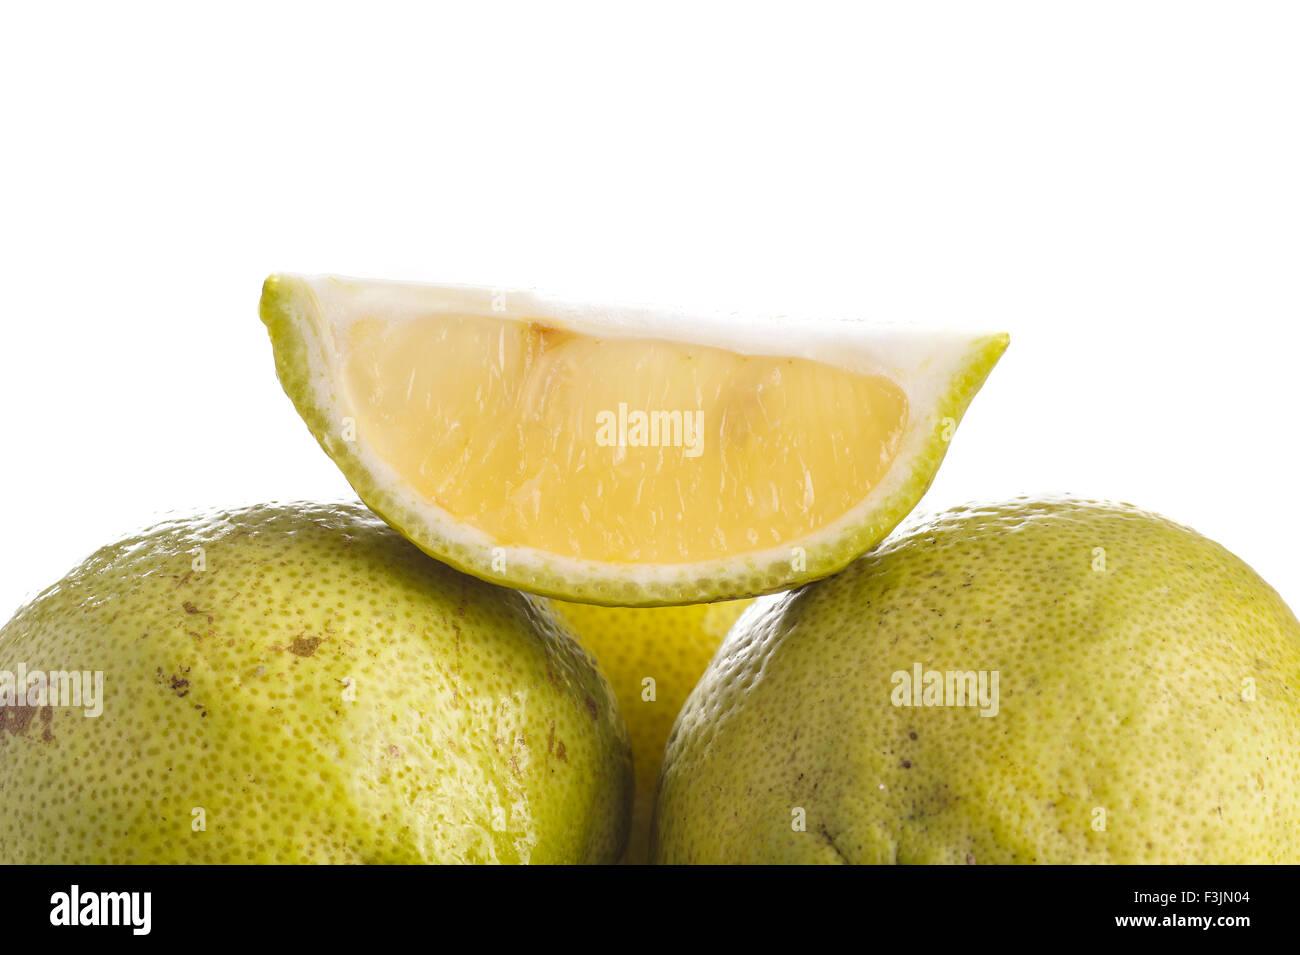 Slice of Green Lemon, isolated on white - Stock Image